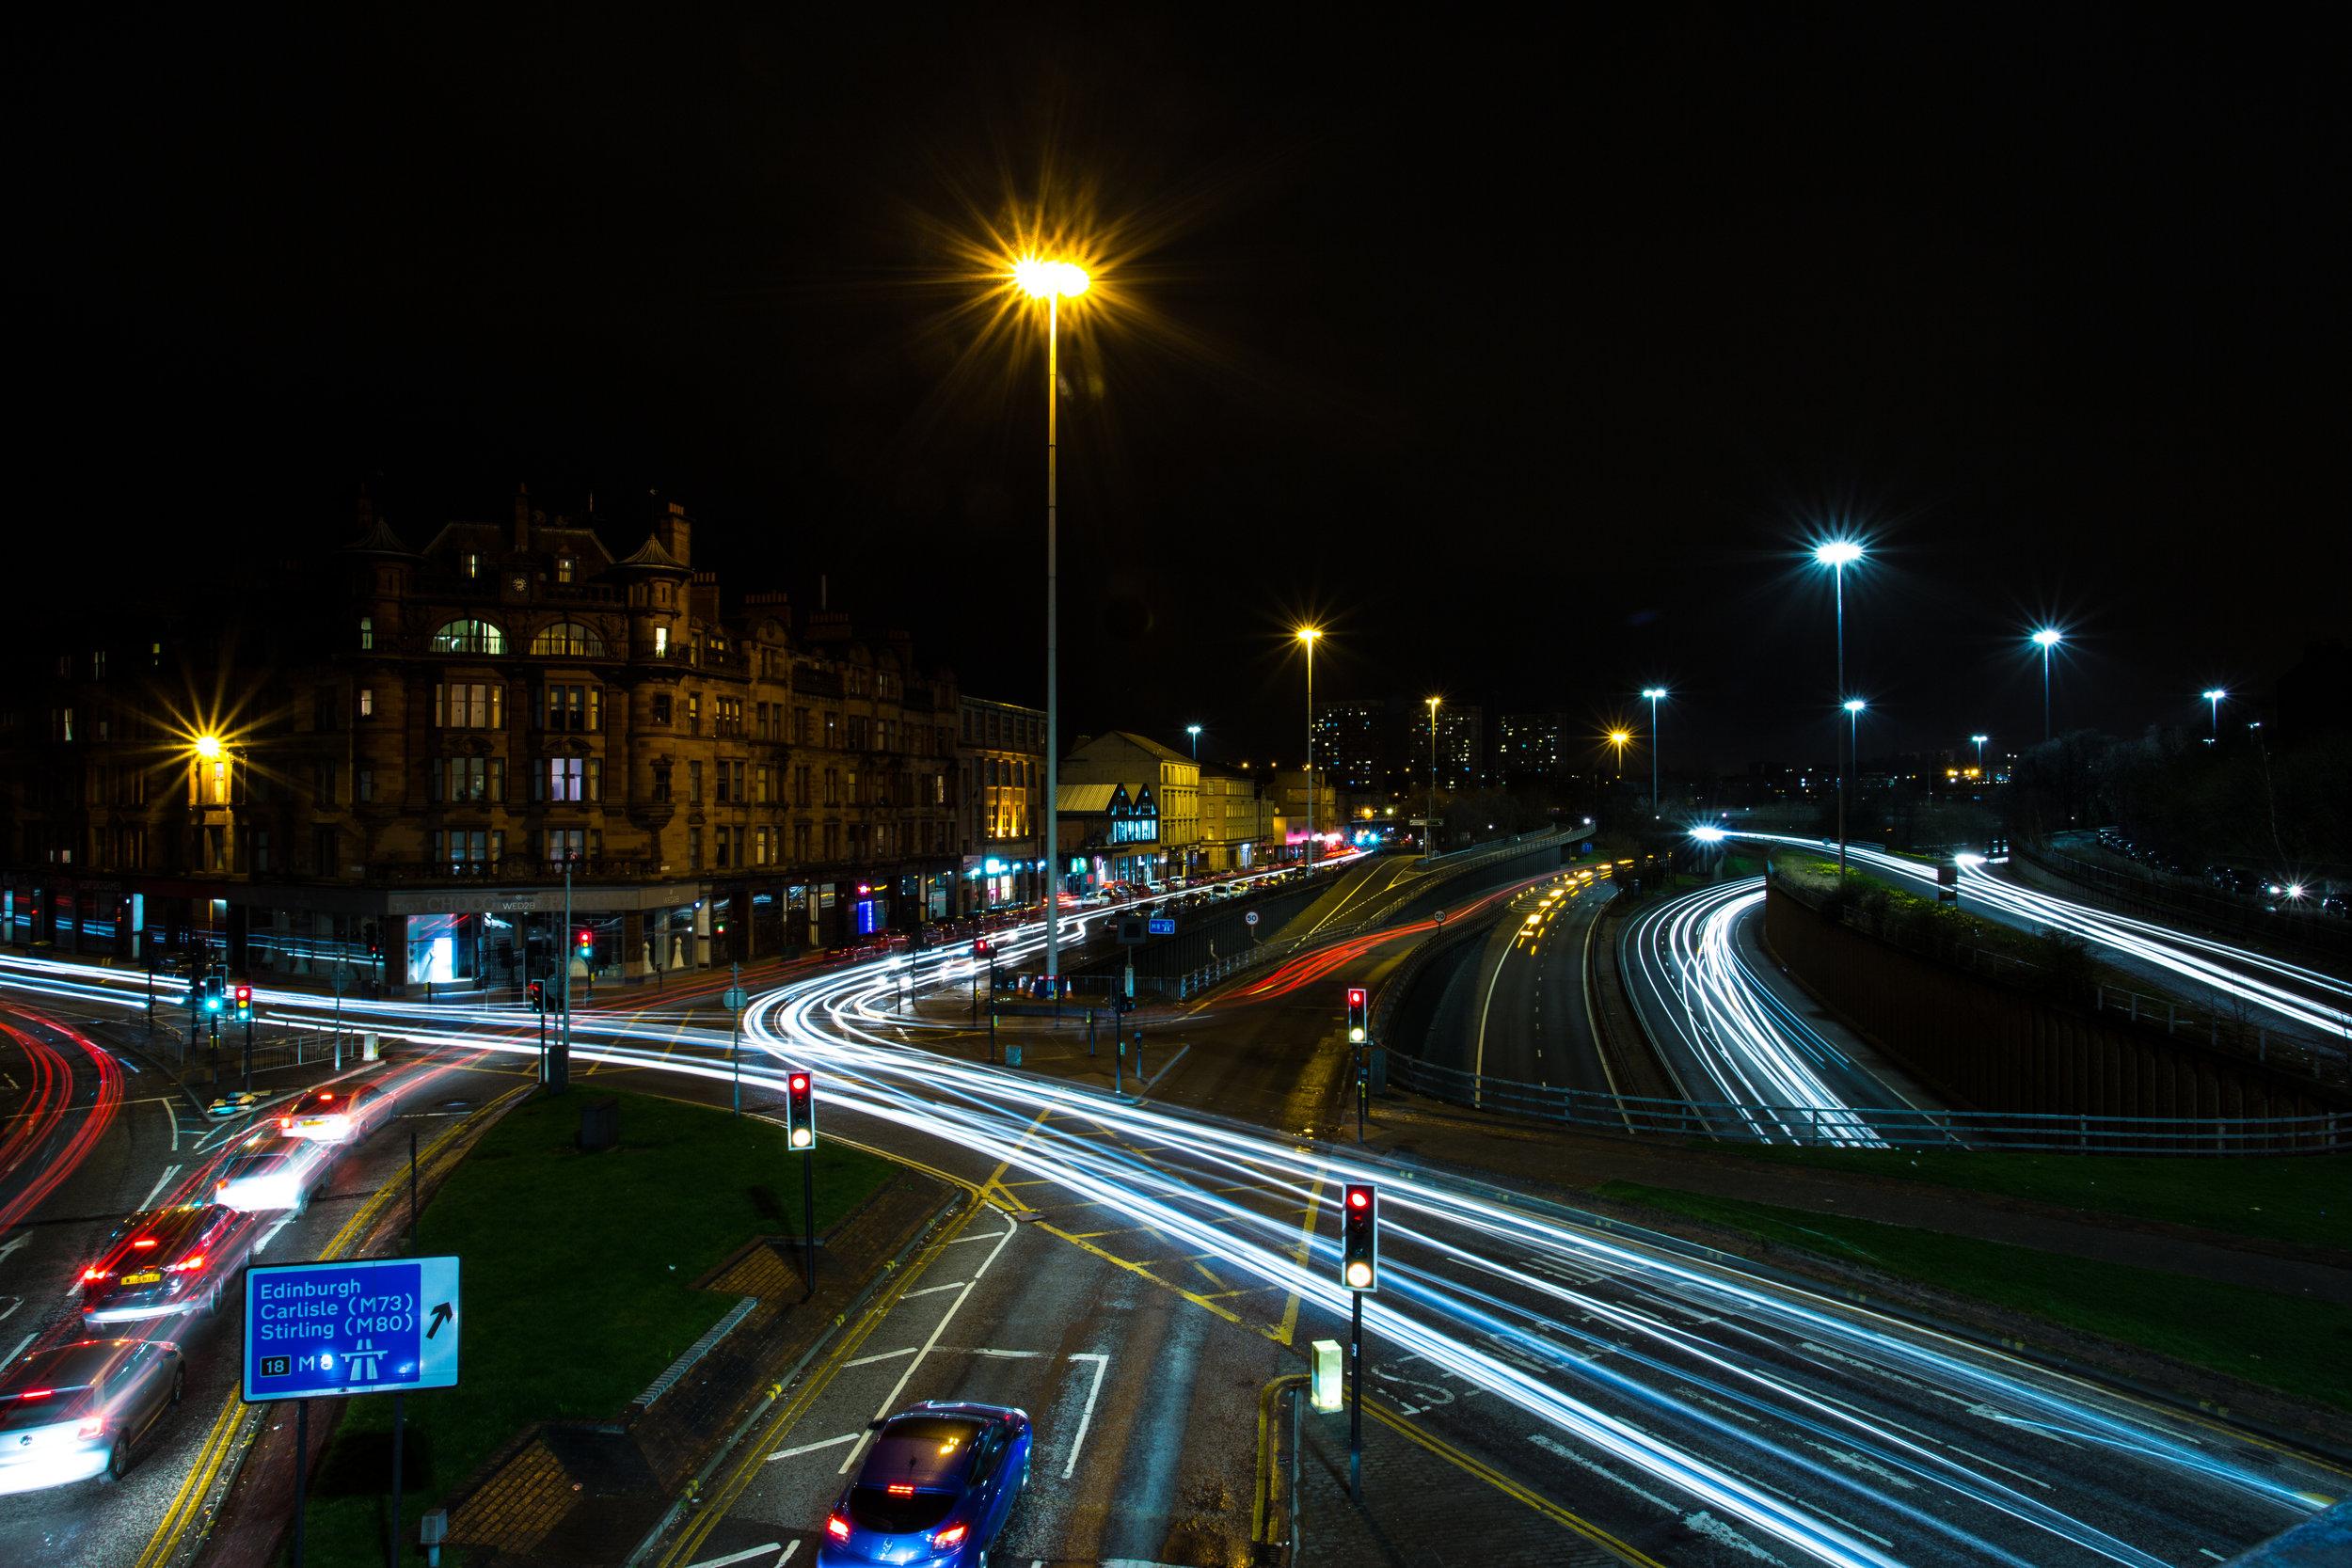 Charing Cross Light Trails